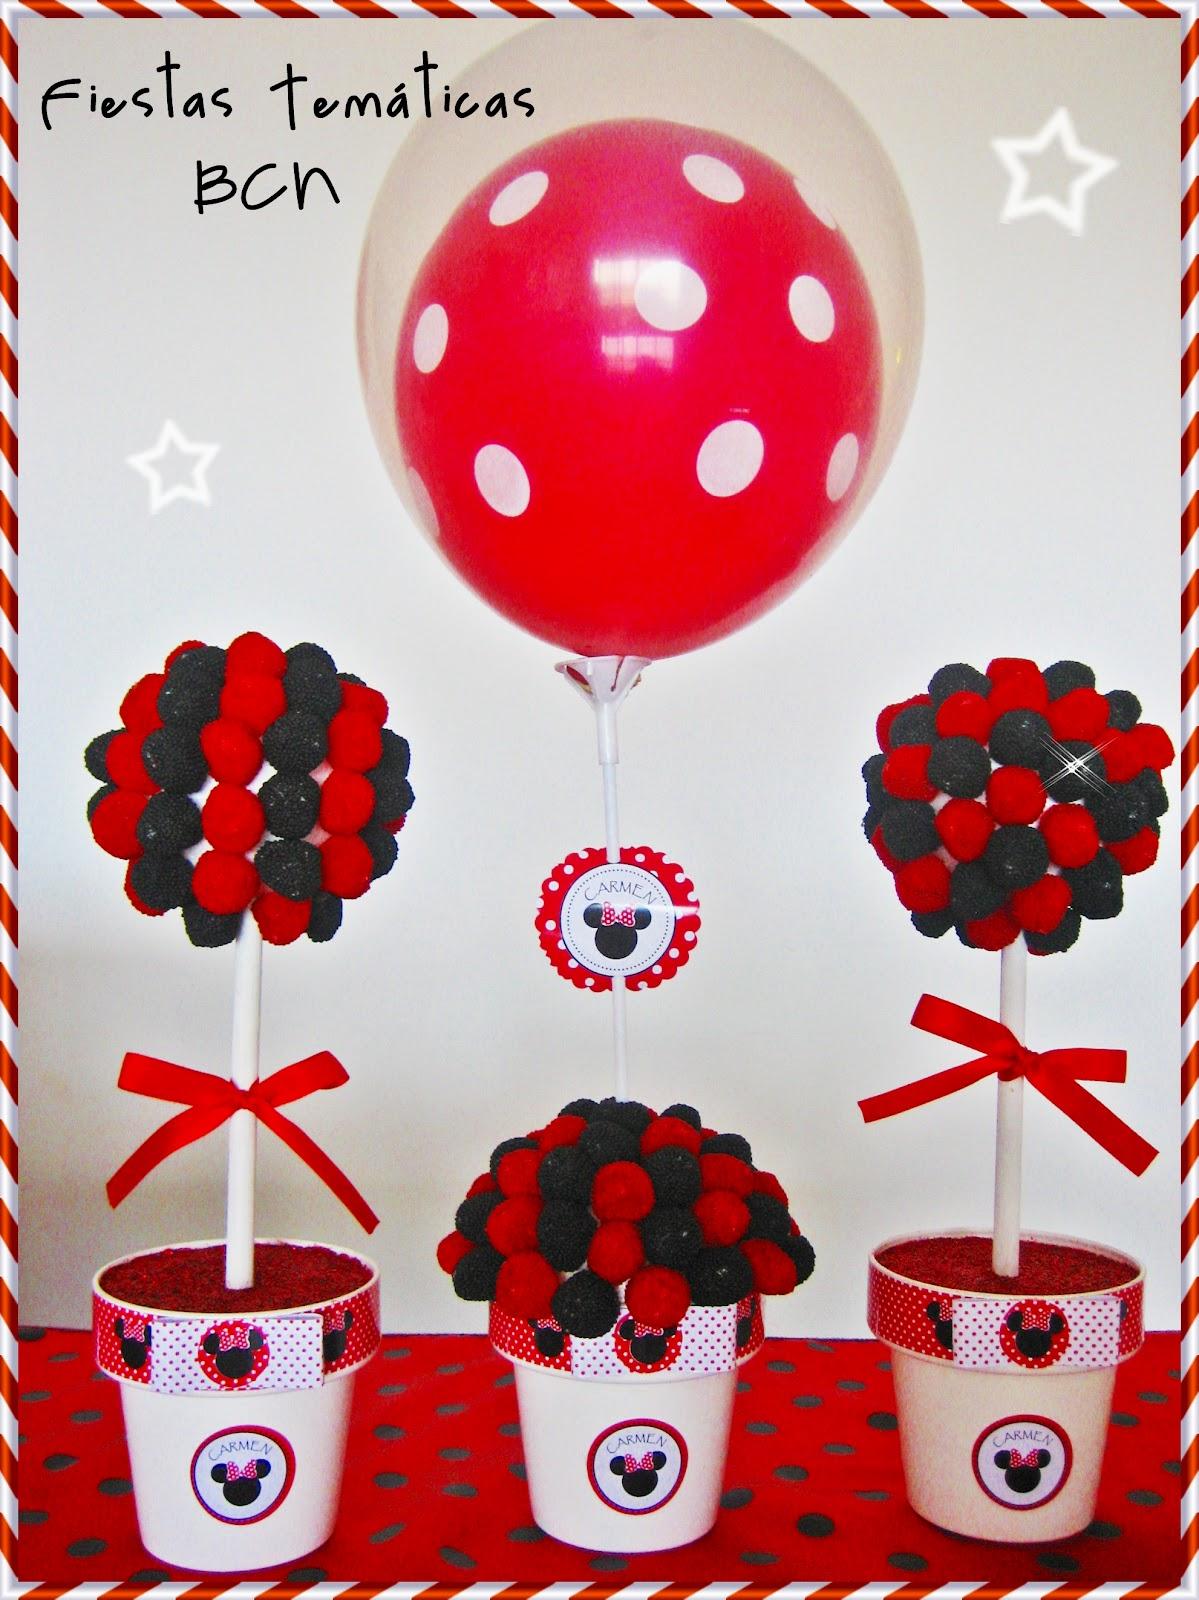 Fiestas tem ticas bcn kits de fiesta imprimibles chuches - Decoracion chuches para cumpleanos ...